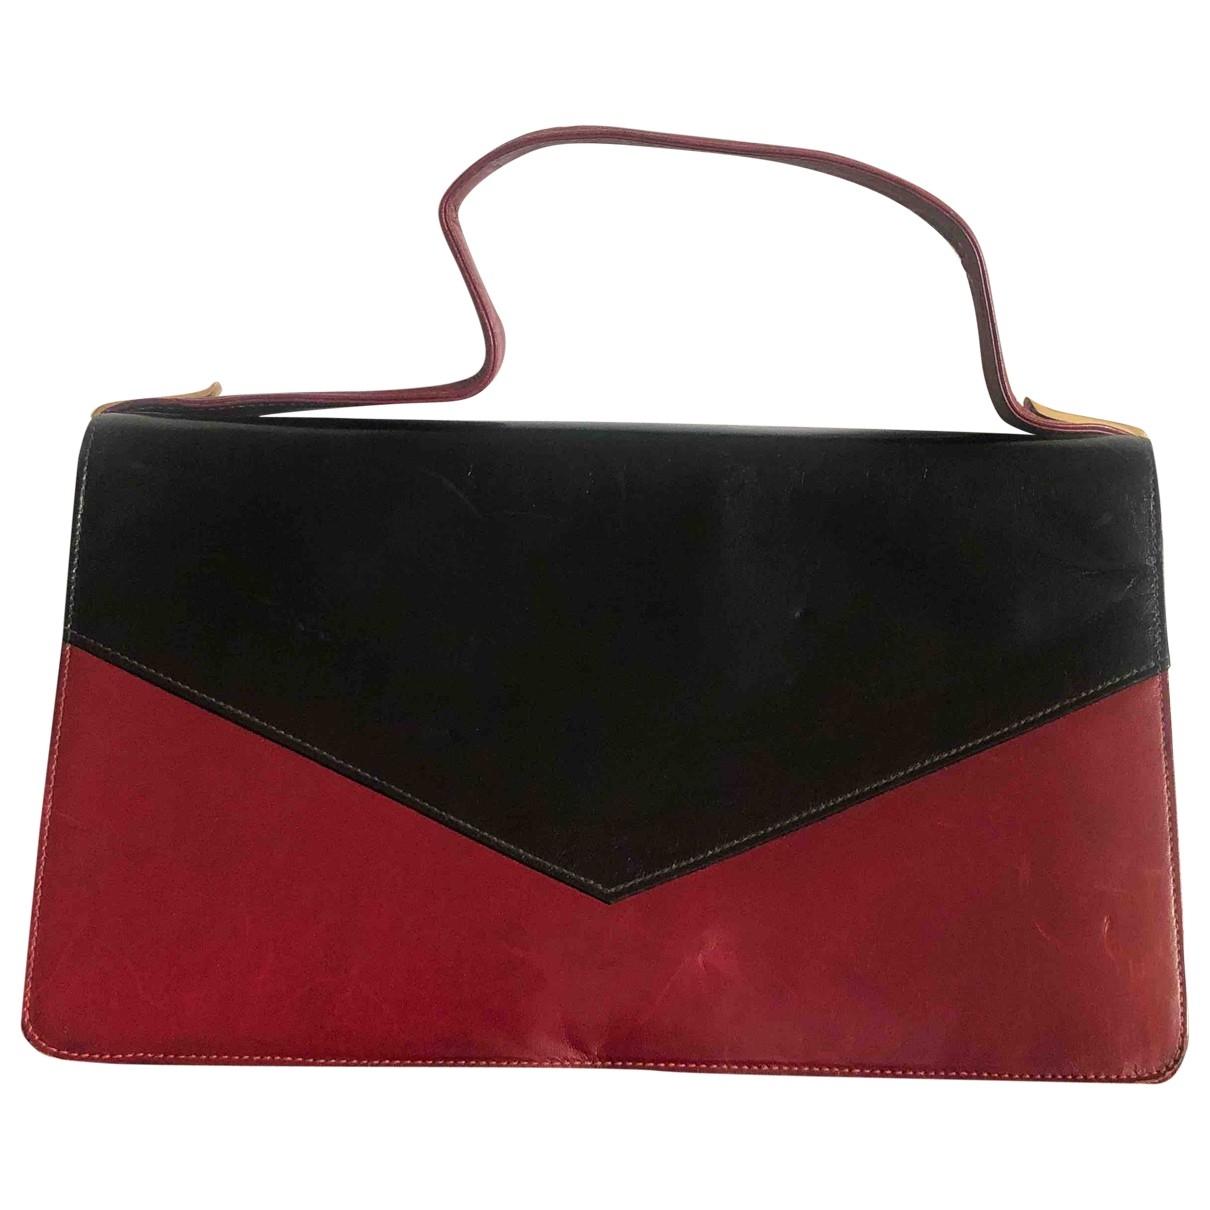 Bally \N Multicolour Leather handbag for Women \N